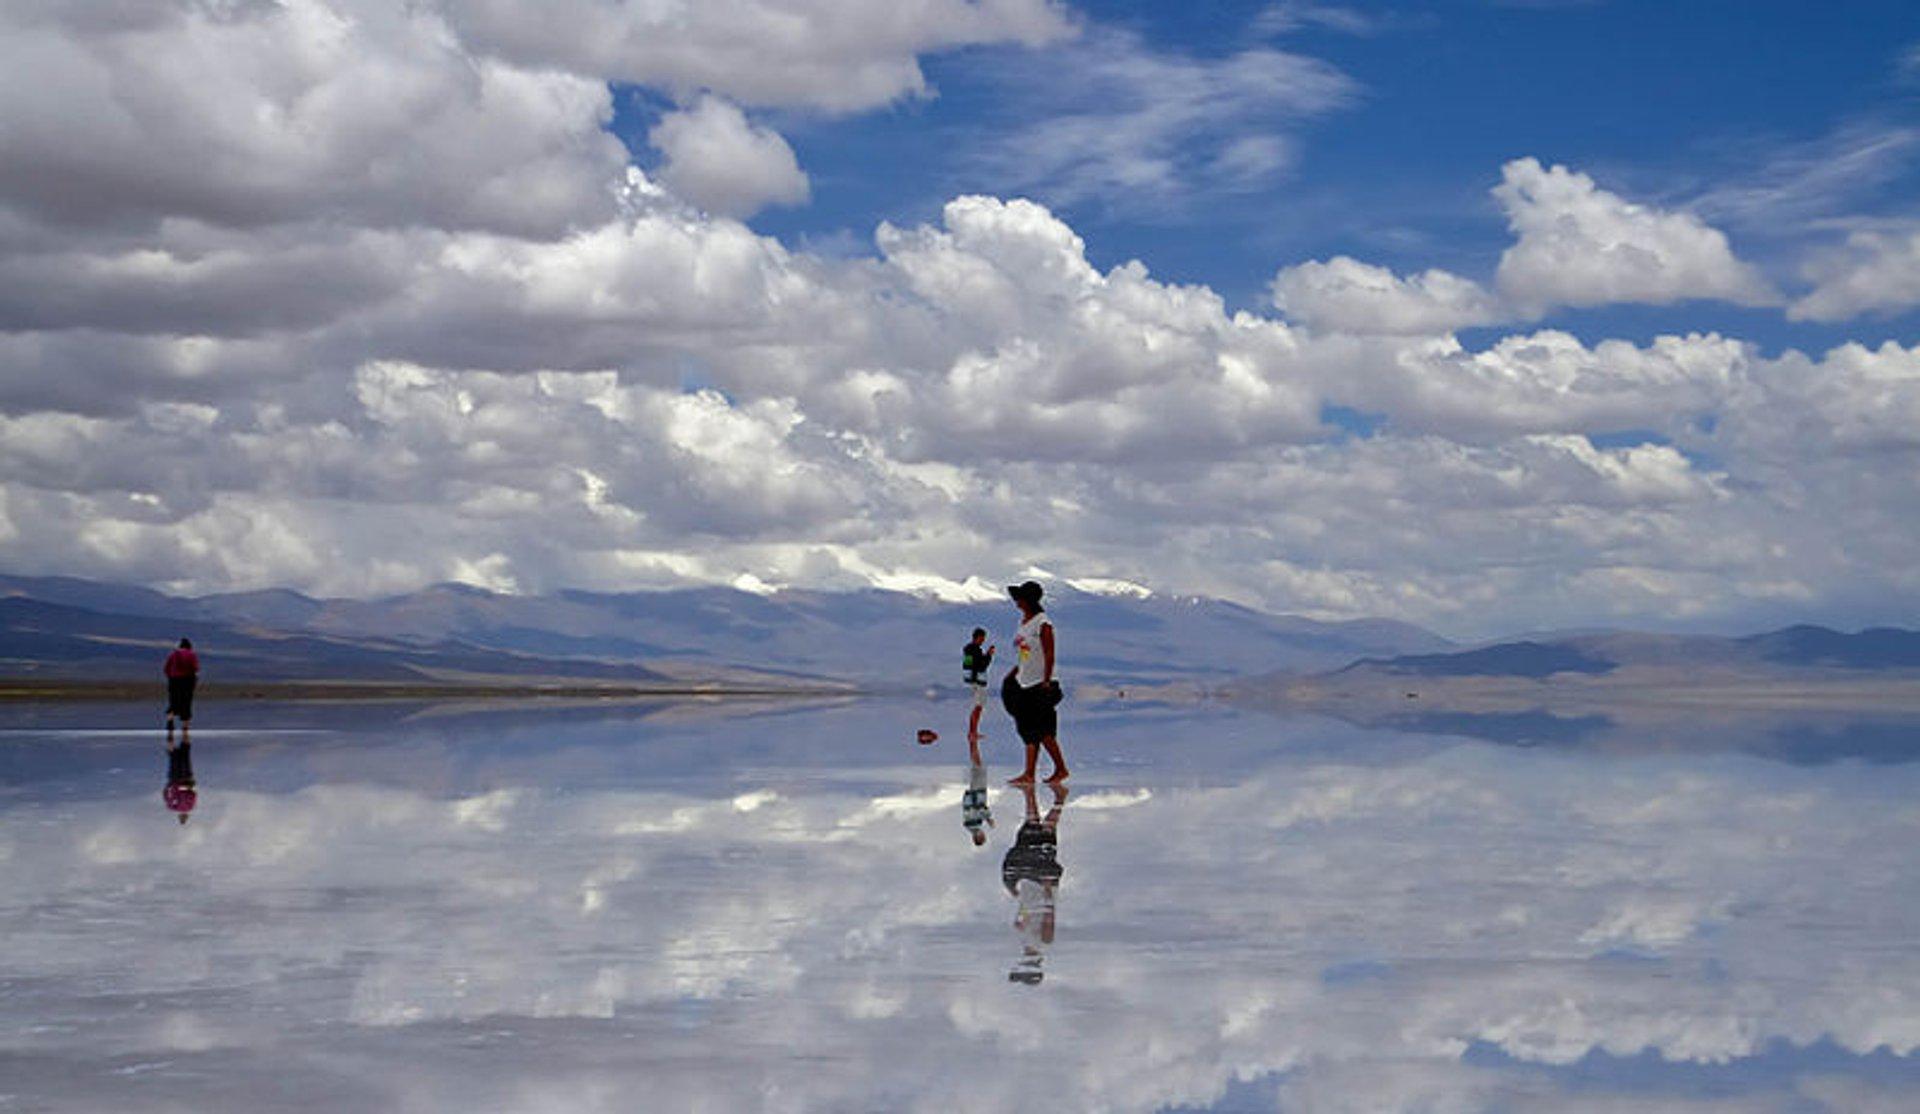 meraviglie naturali dell'argentina salinas grandes jujuy